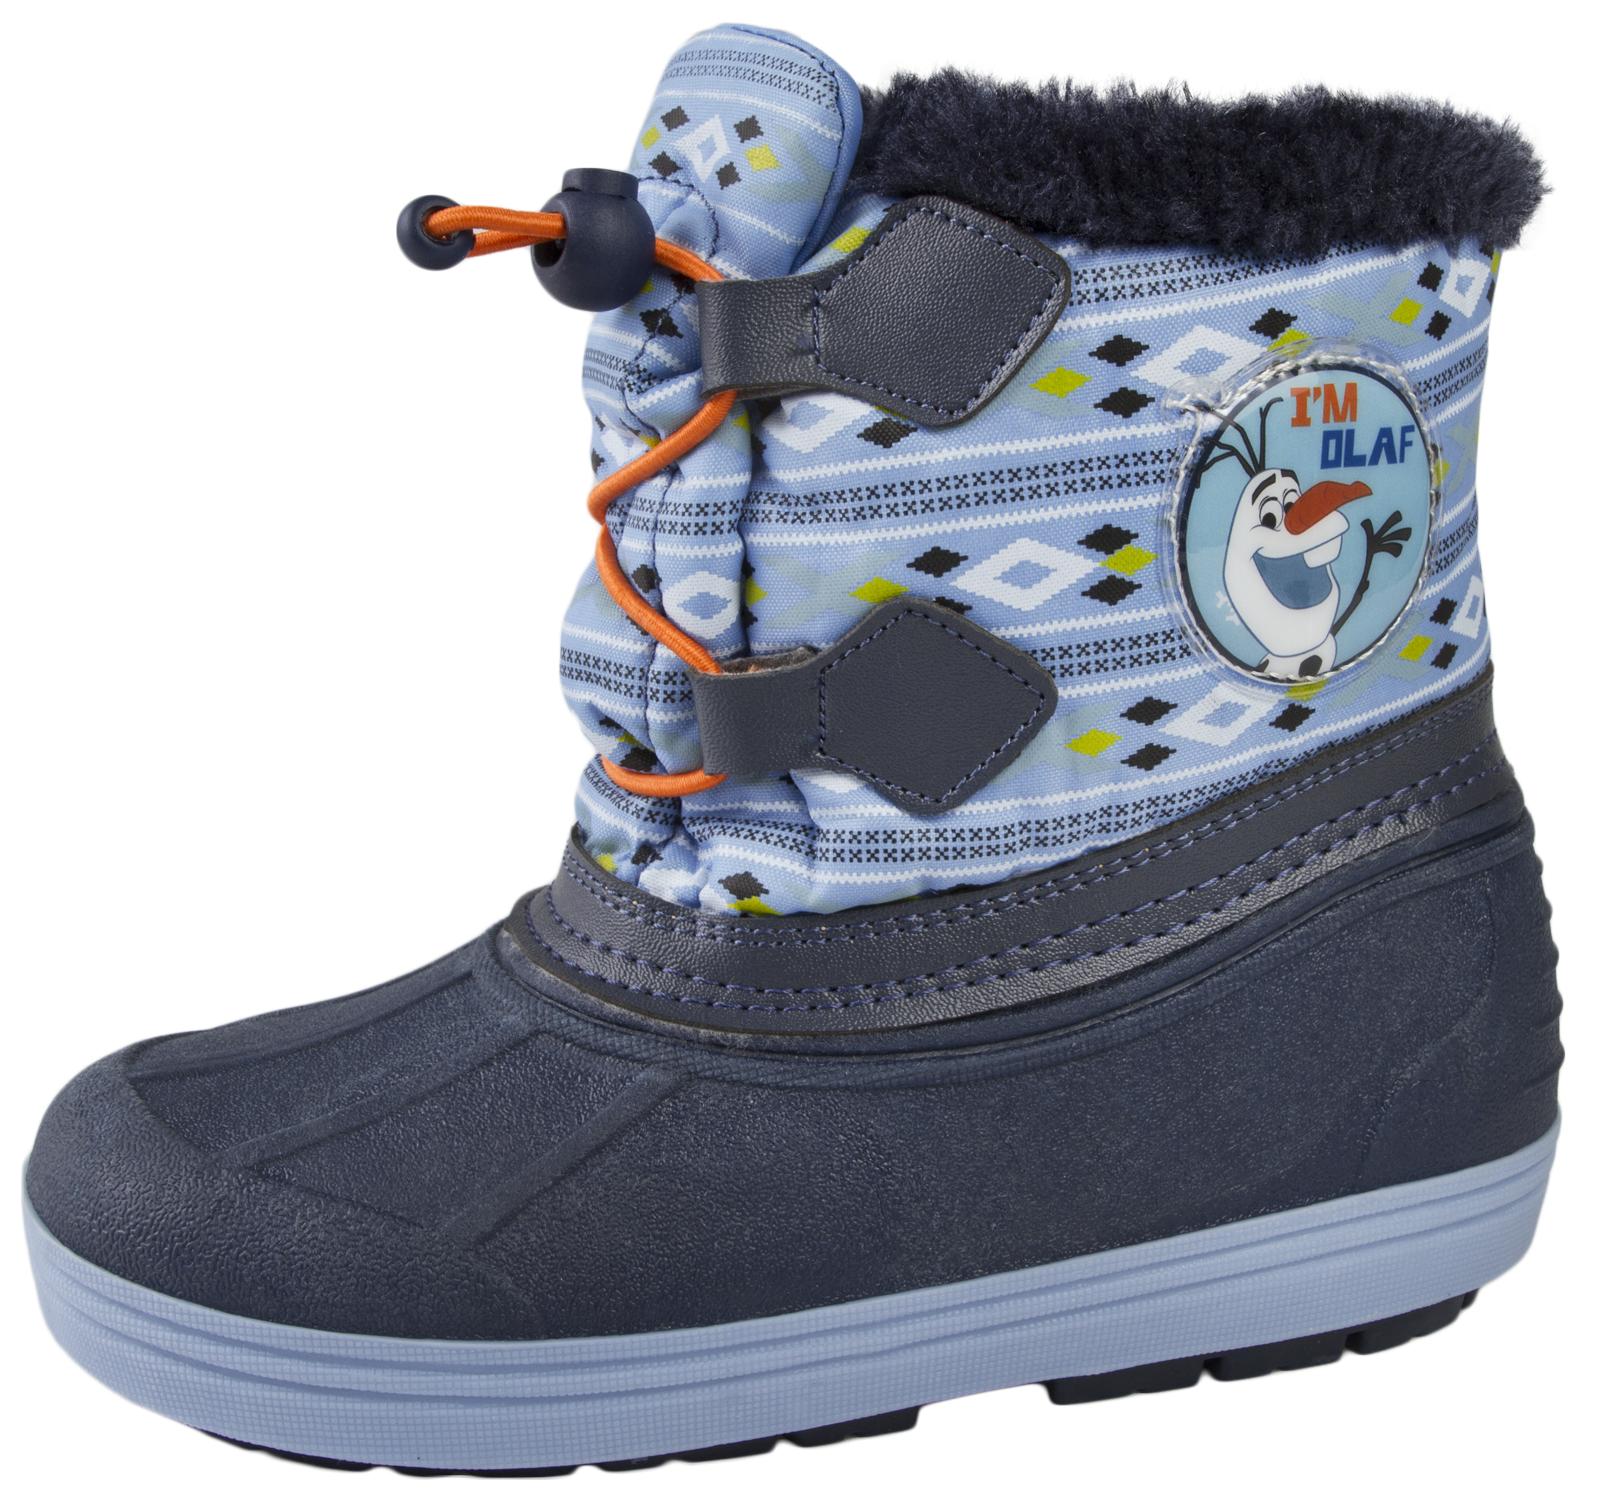 Disney Frozen Olaf Snow Boots Waterproof Olaf Rain Wellies